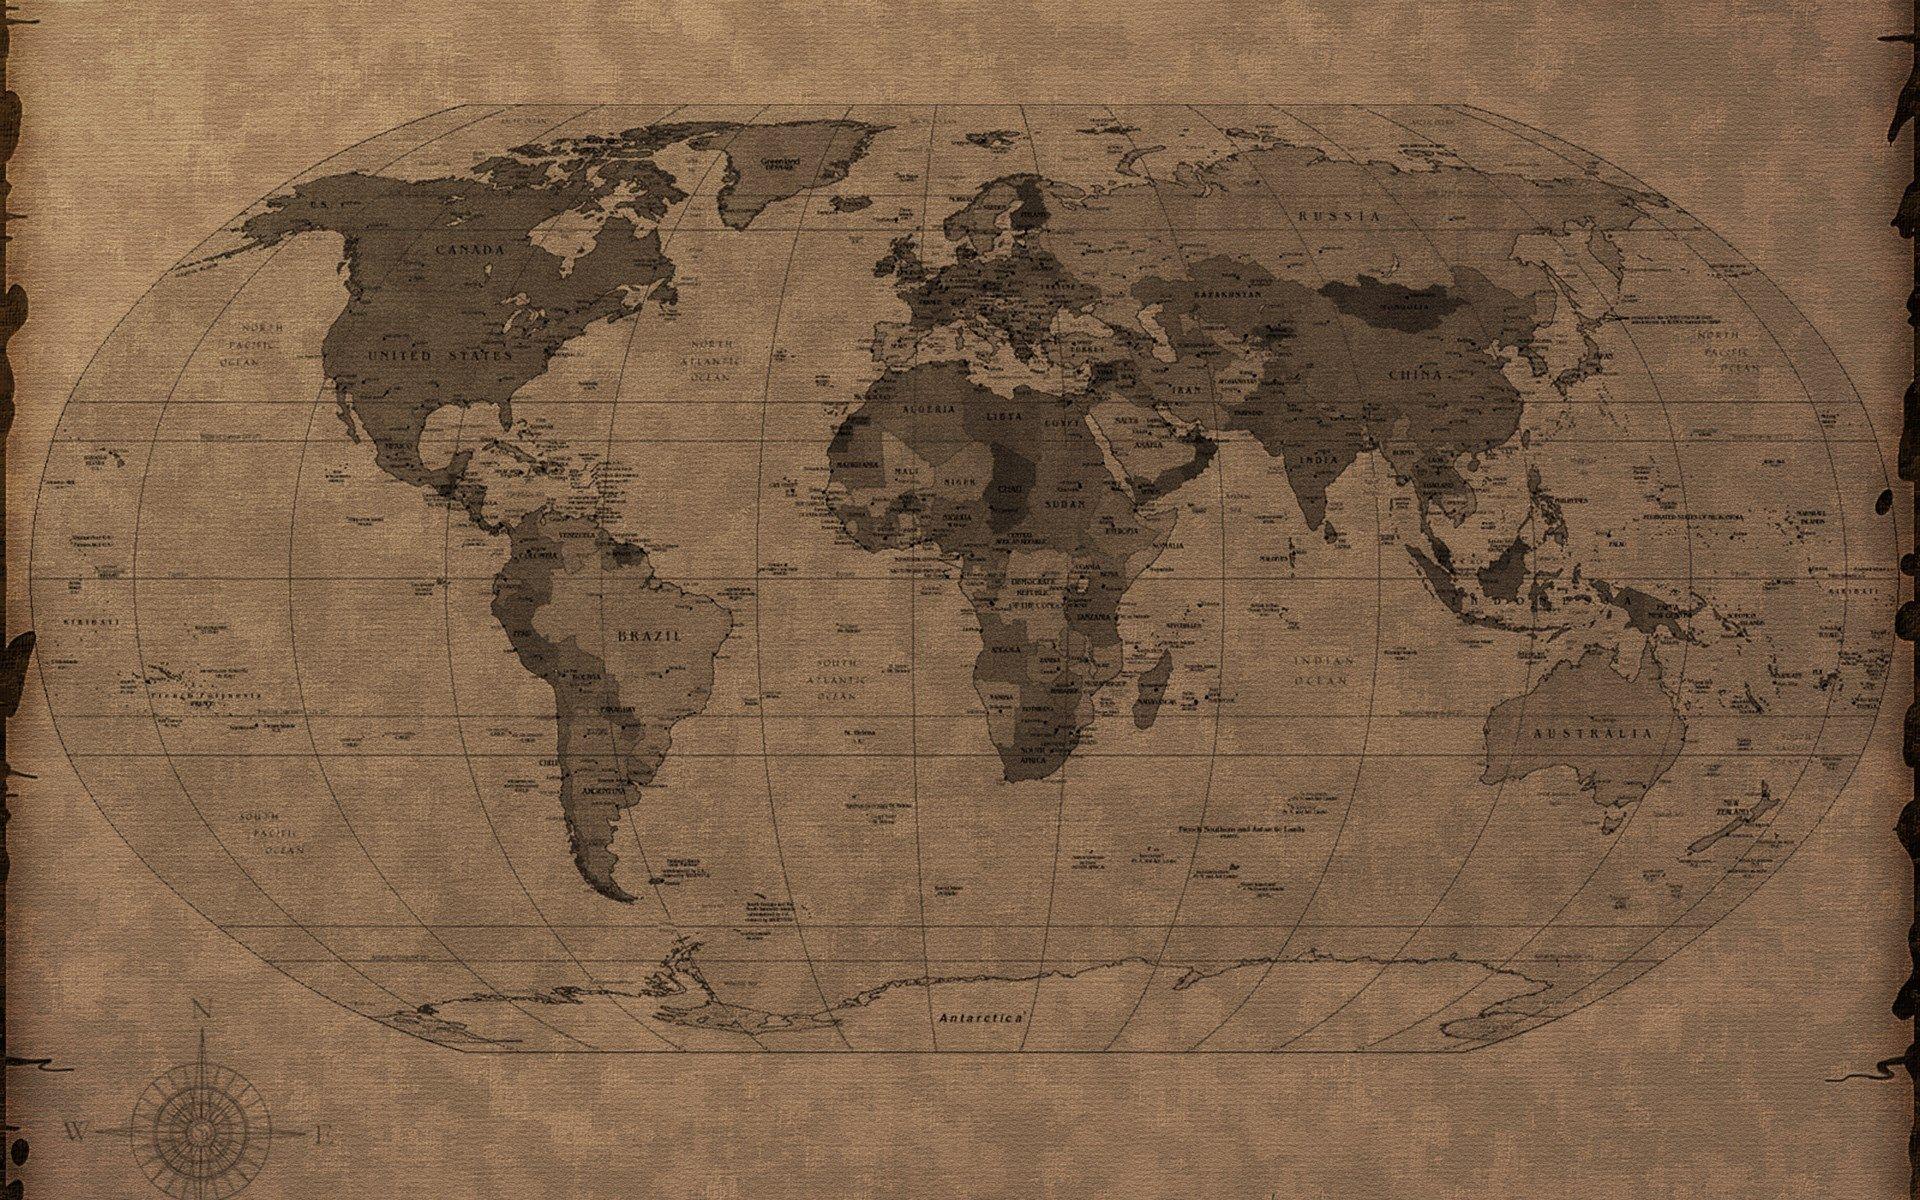 Hq antique map high resolution ololoshenka pinterest hq antique map high resolution gumiabroncs Gallery